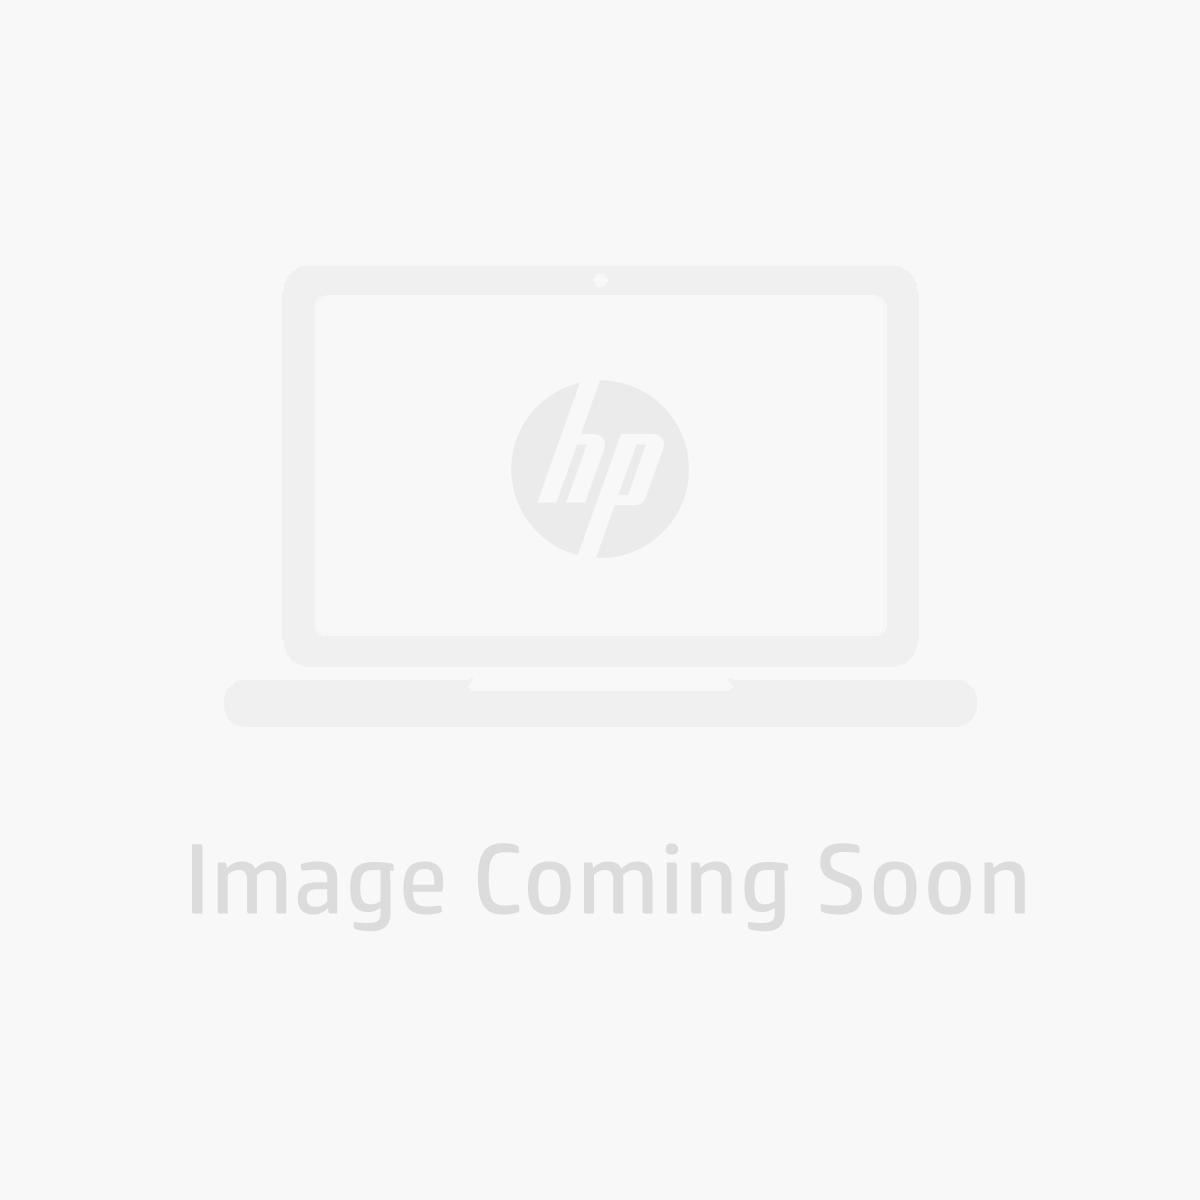 HP Colour LaserJet Professional CP5225dn Printer